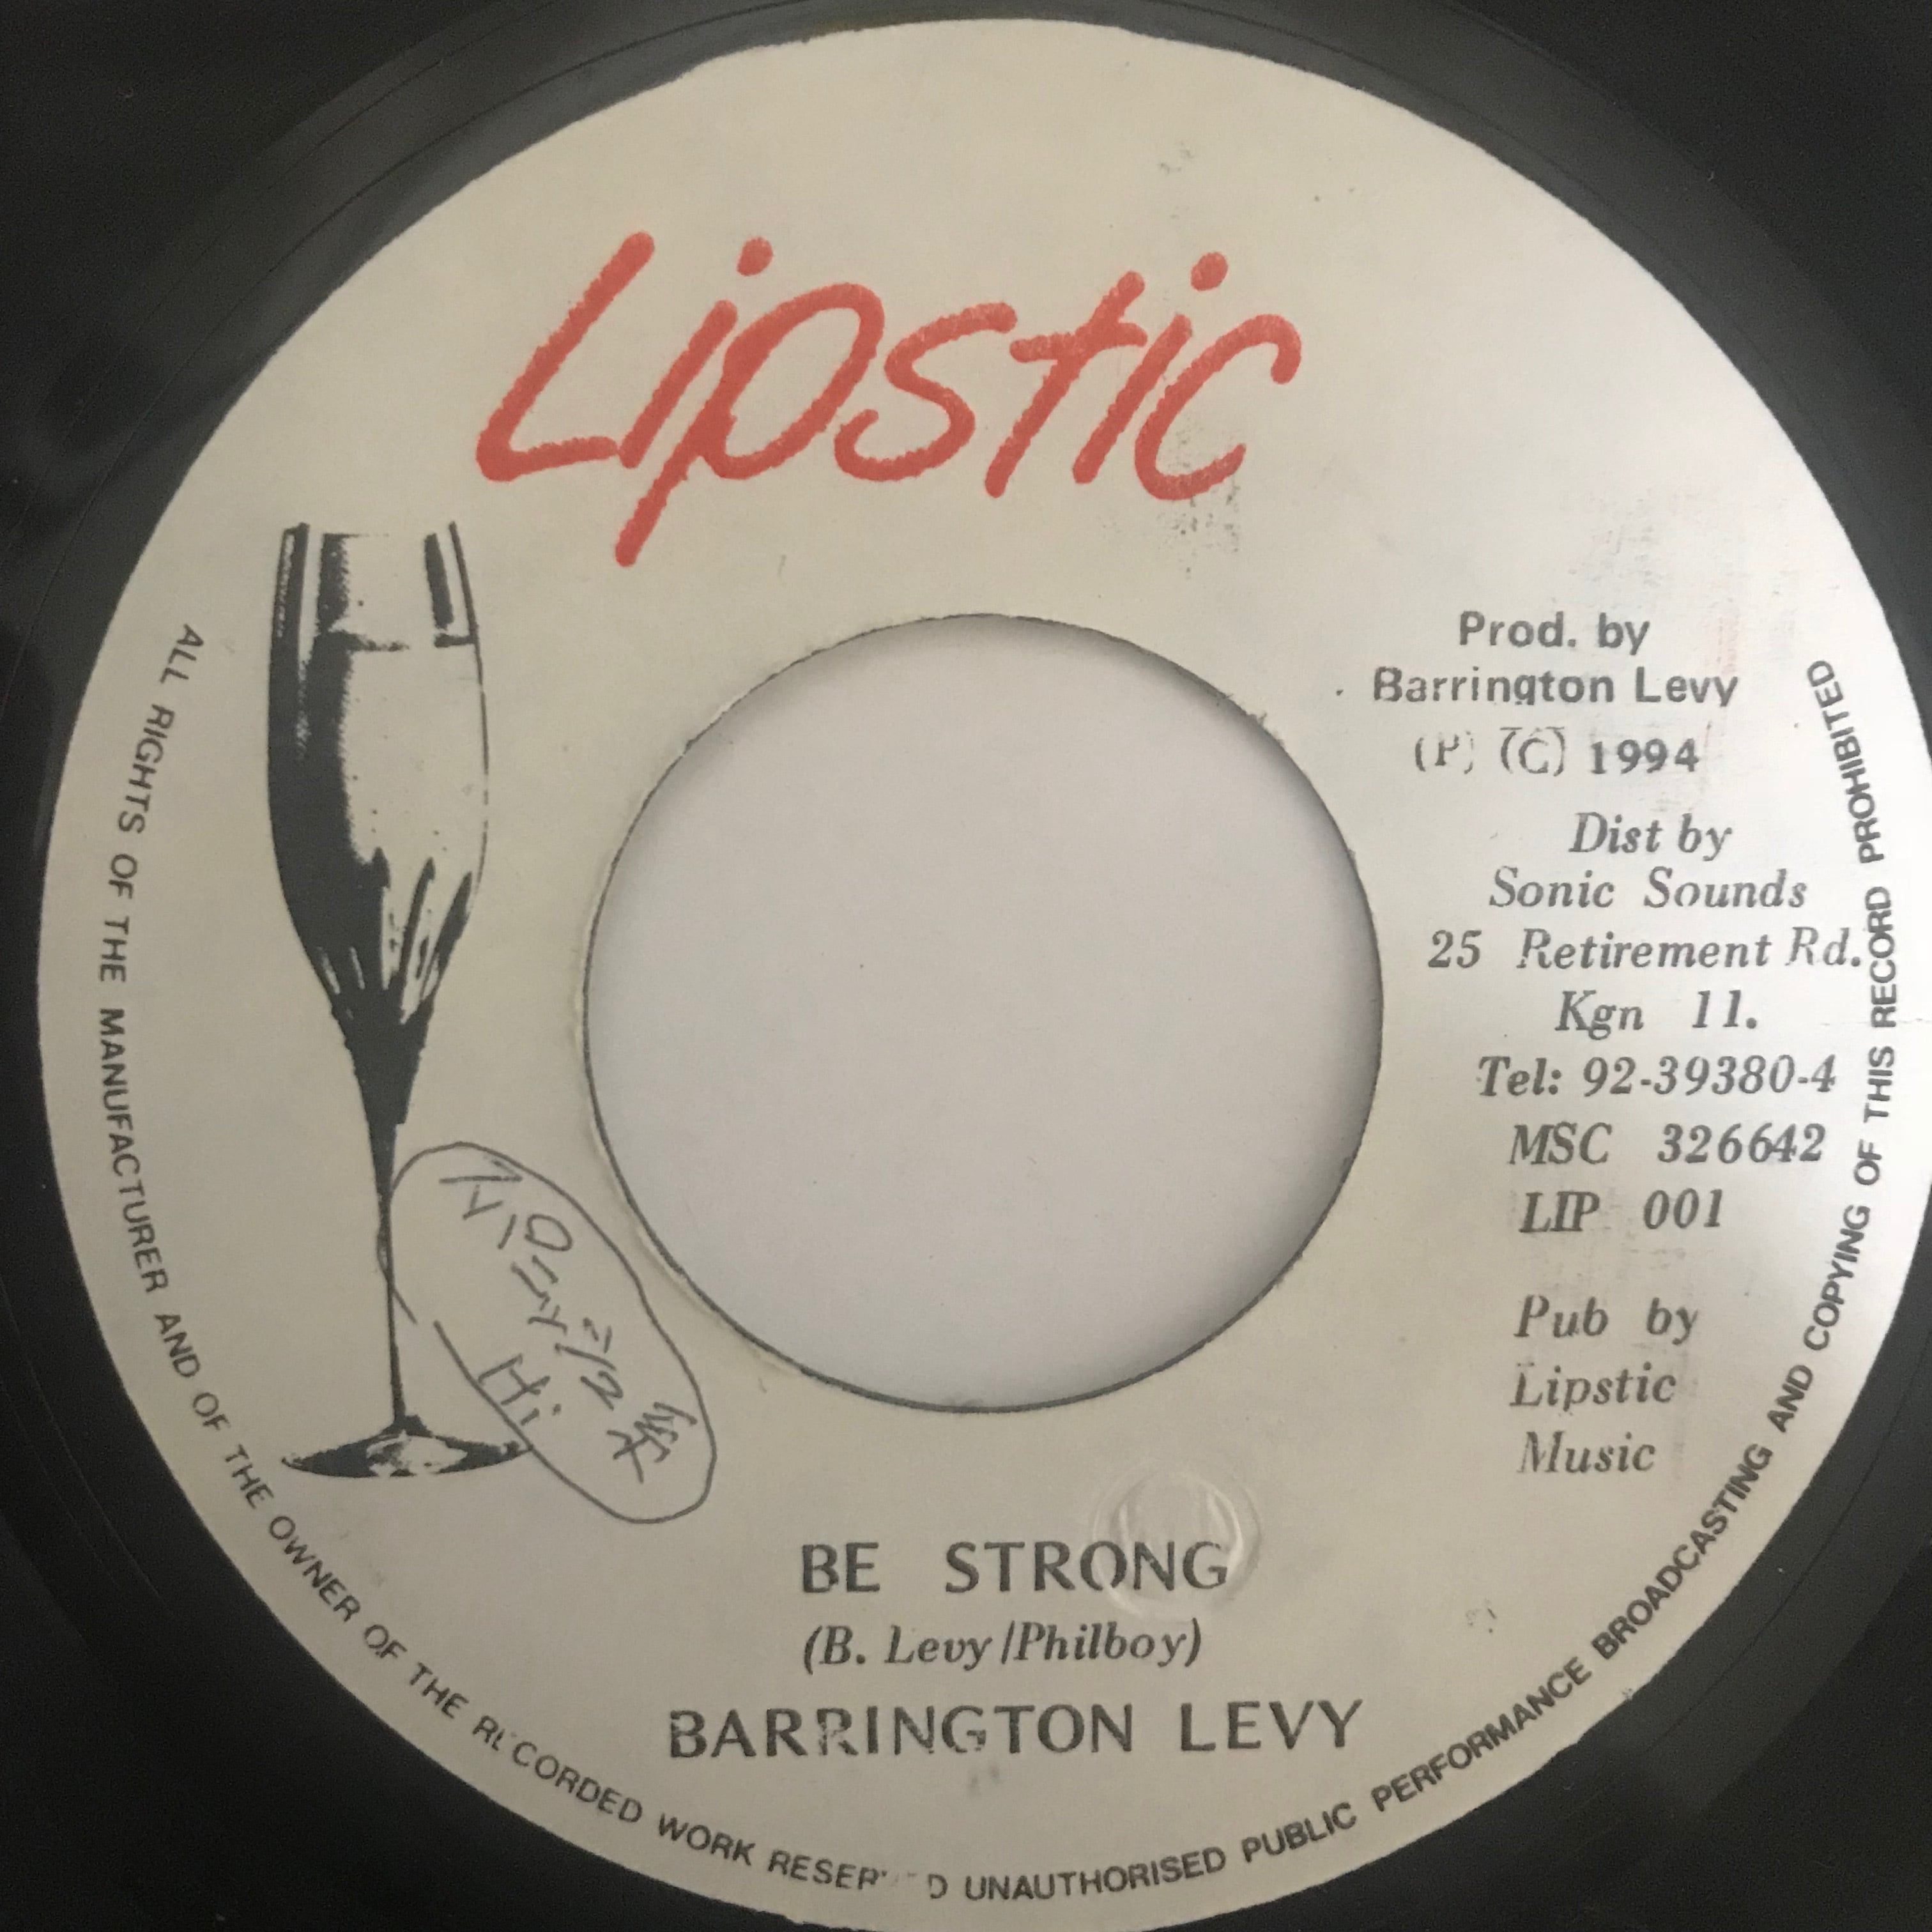 Barrington Levy(バーリントンリビィ) - Be Storong【7-10769】